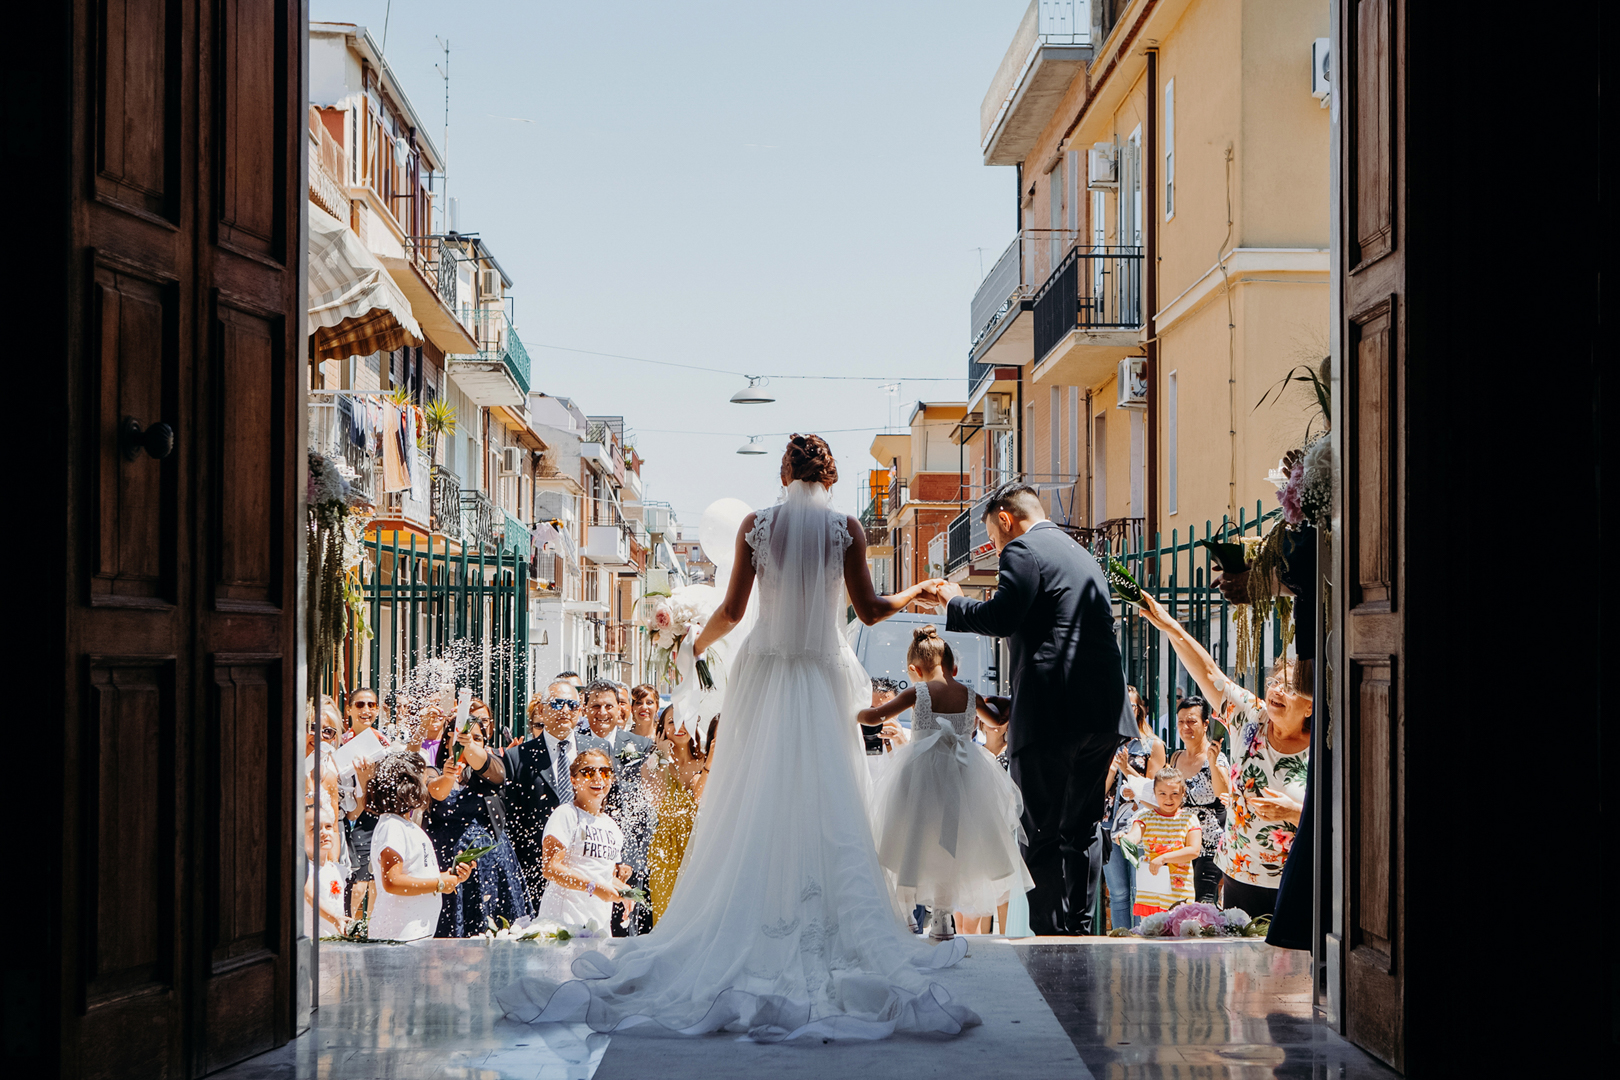 14 gianni-lepore-fotografo-italia-matrimonio-uscita-chiesa